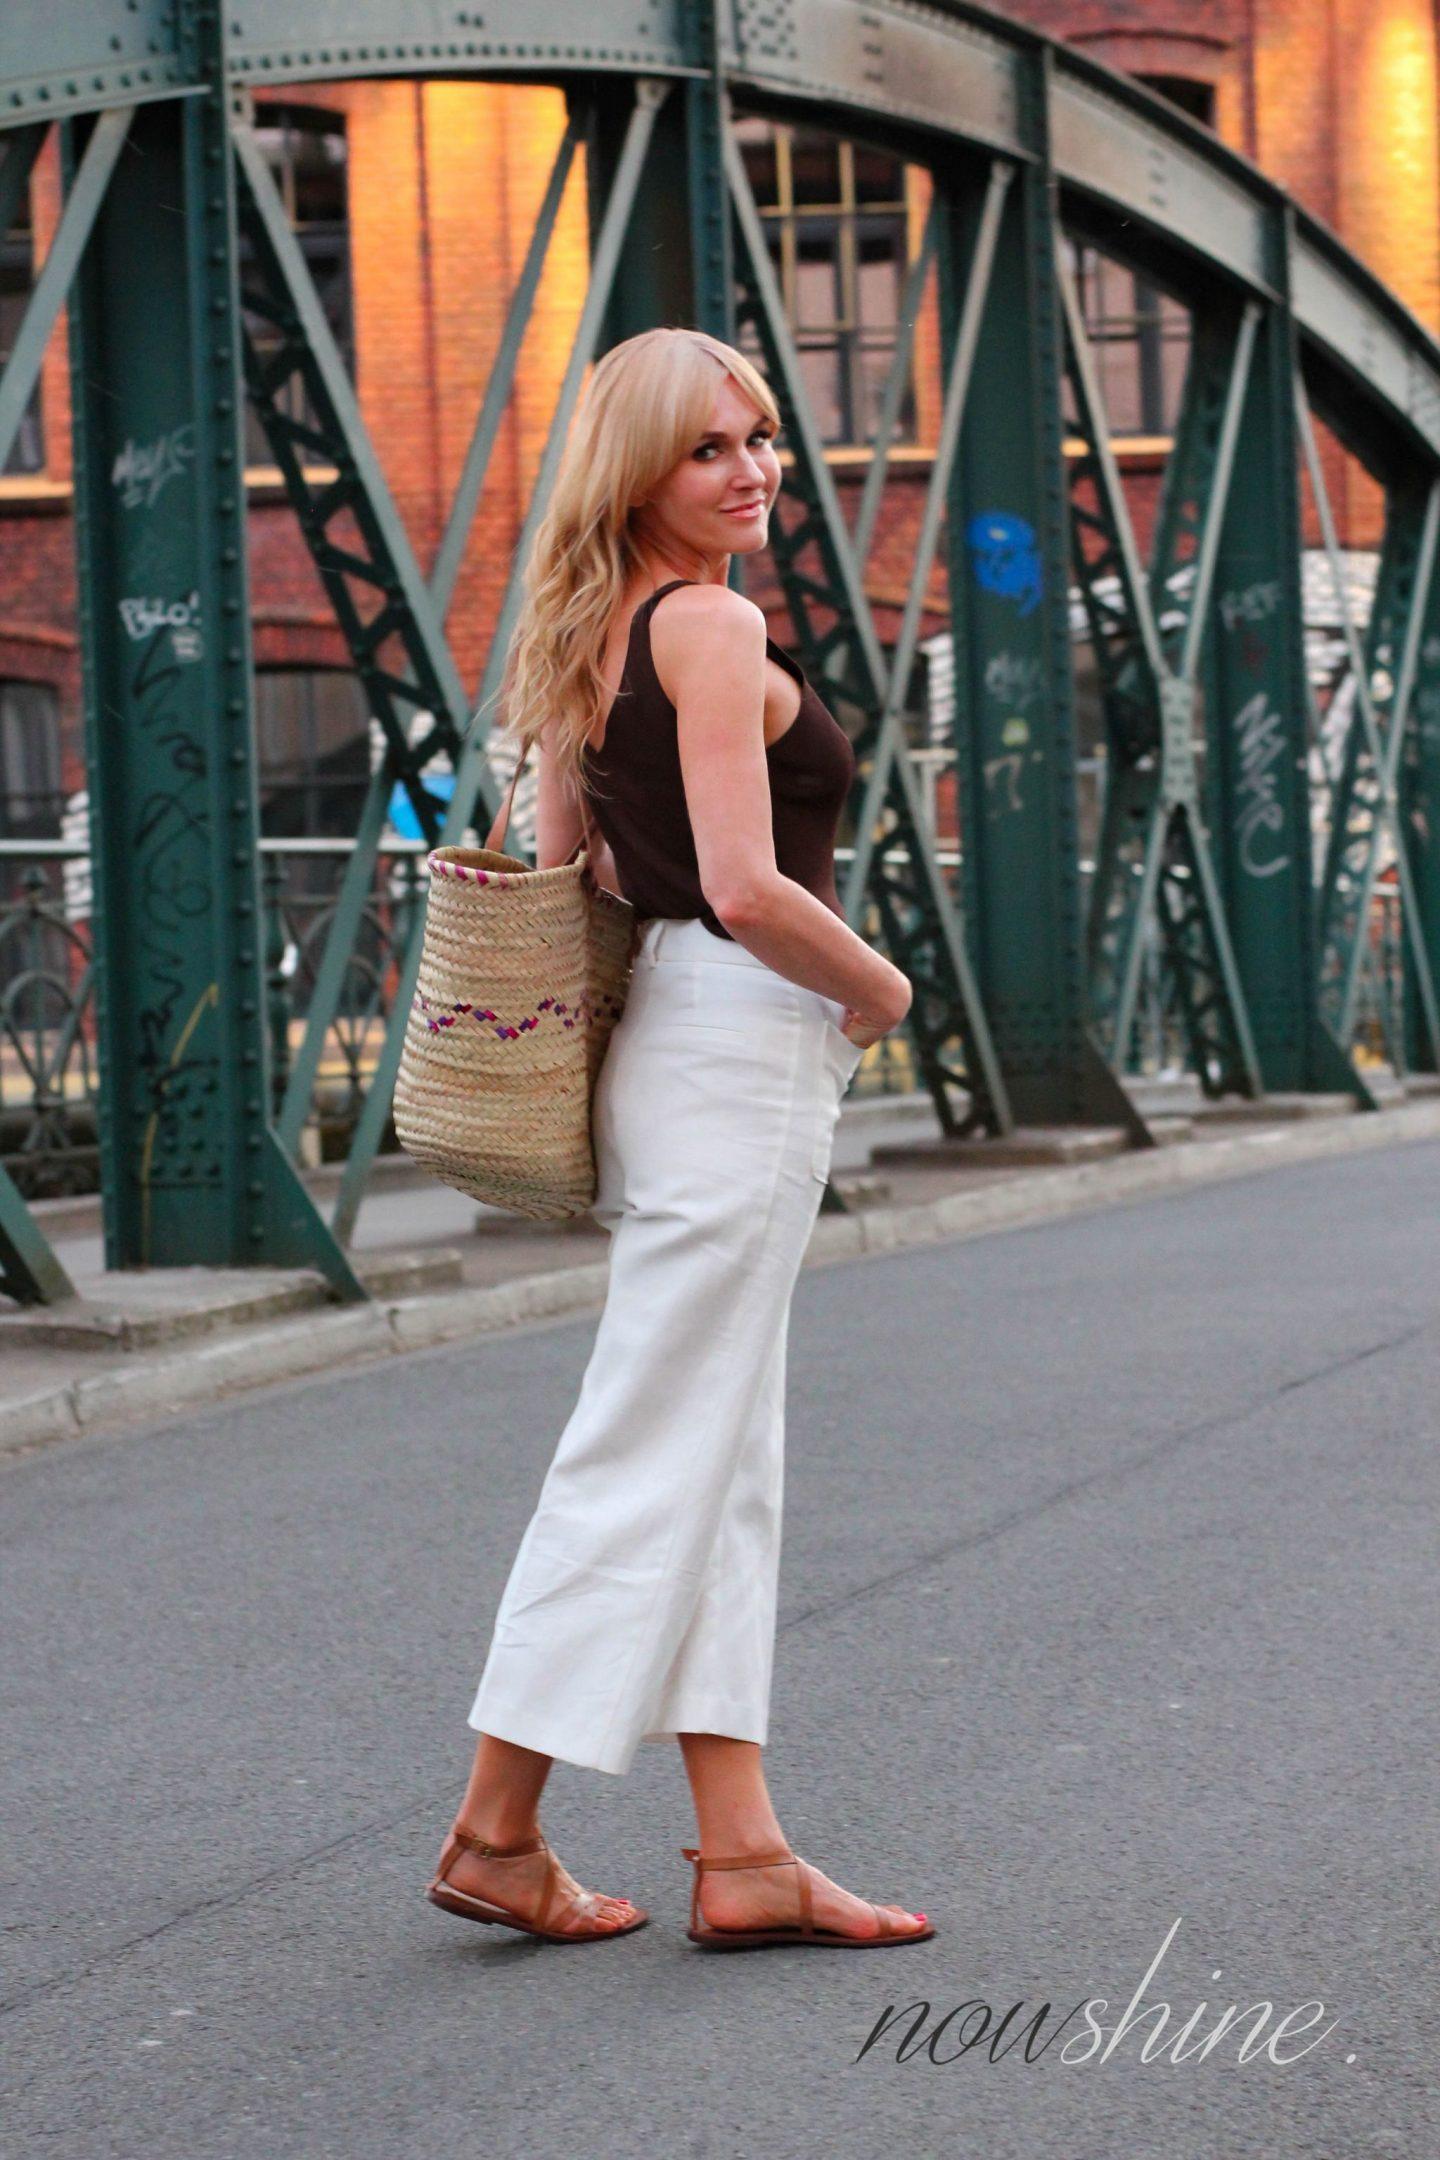 H&M Premium Sandalen in Cognac - Nowshine ü40 Fashion Blog